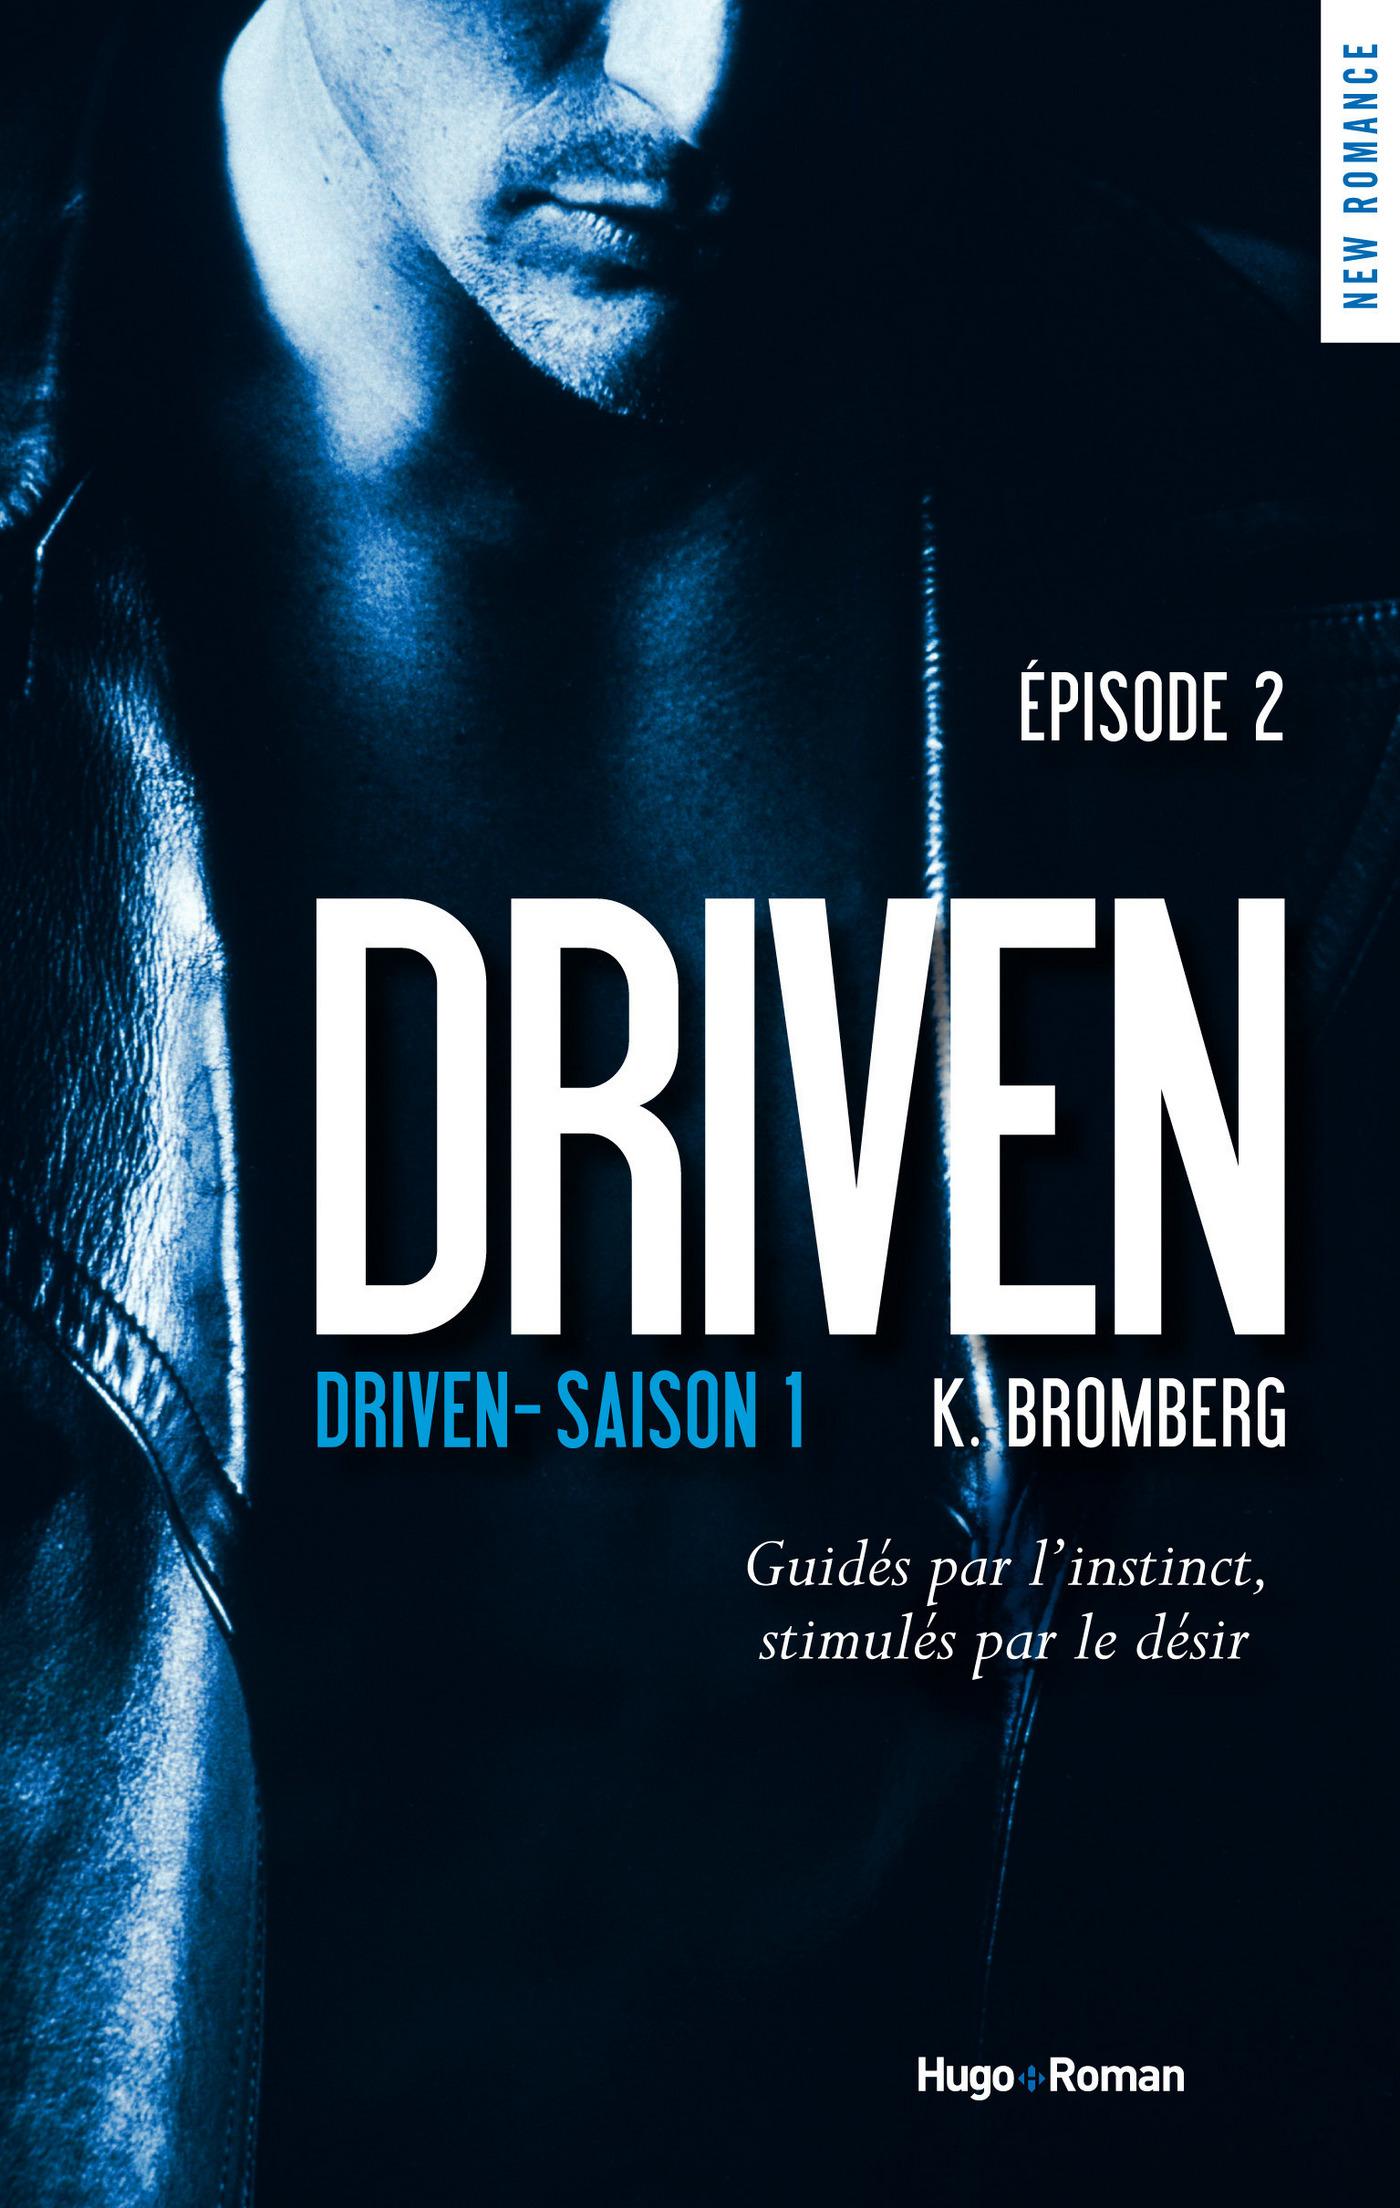 Driven Saison 1 Episode 2